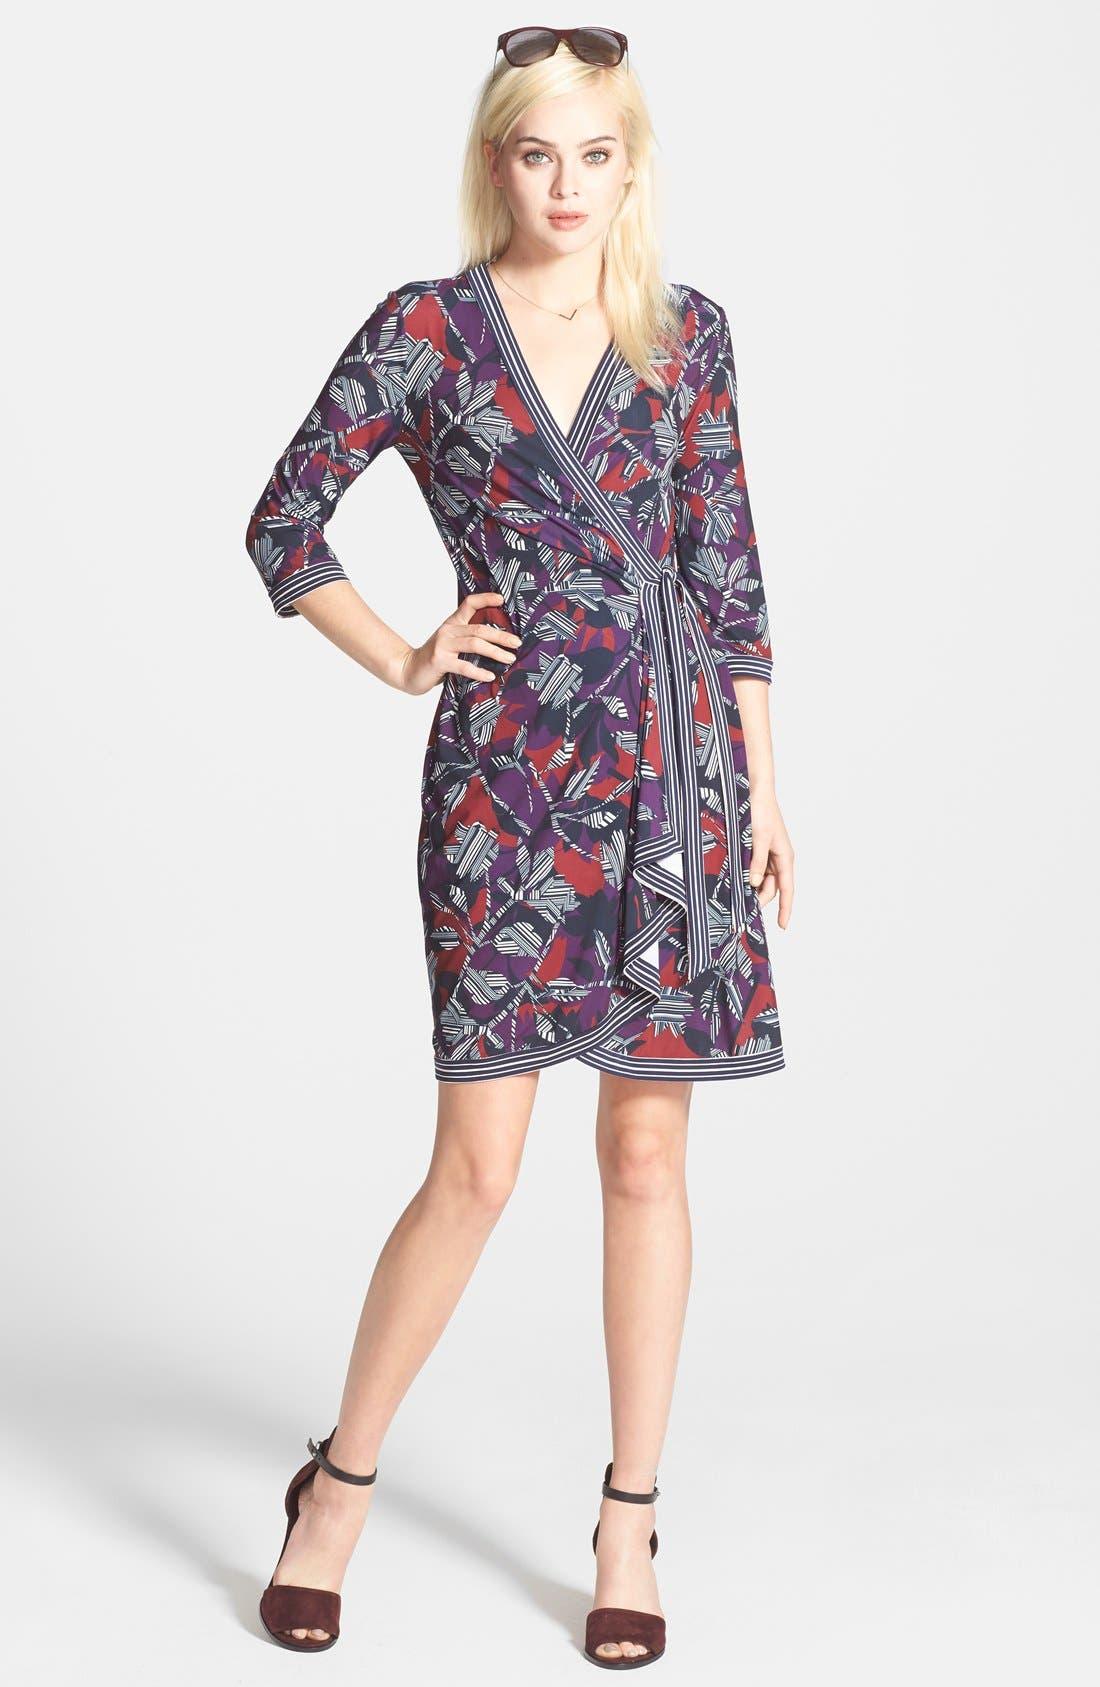 Alternate Image 1 Selected - BCBGMAXAZRIA 'Adele' Print Matte Jersey Wrap Dress